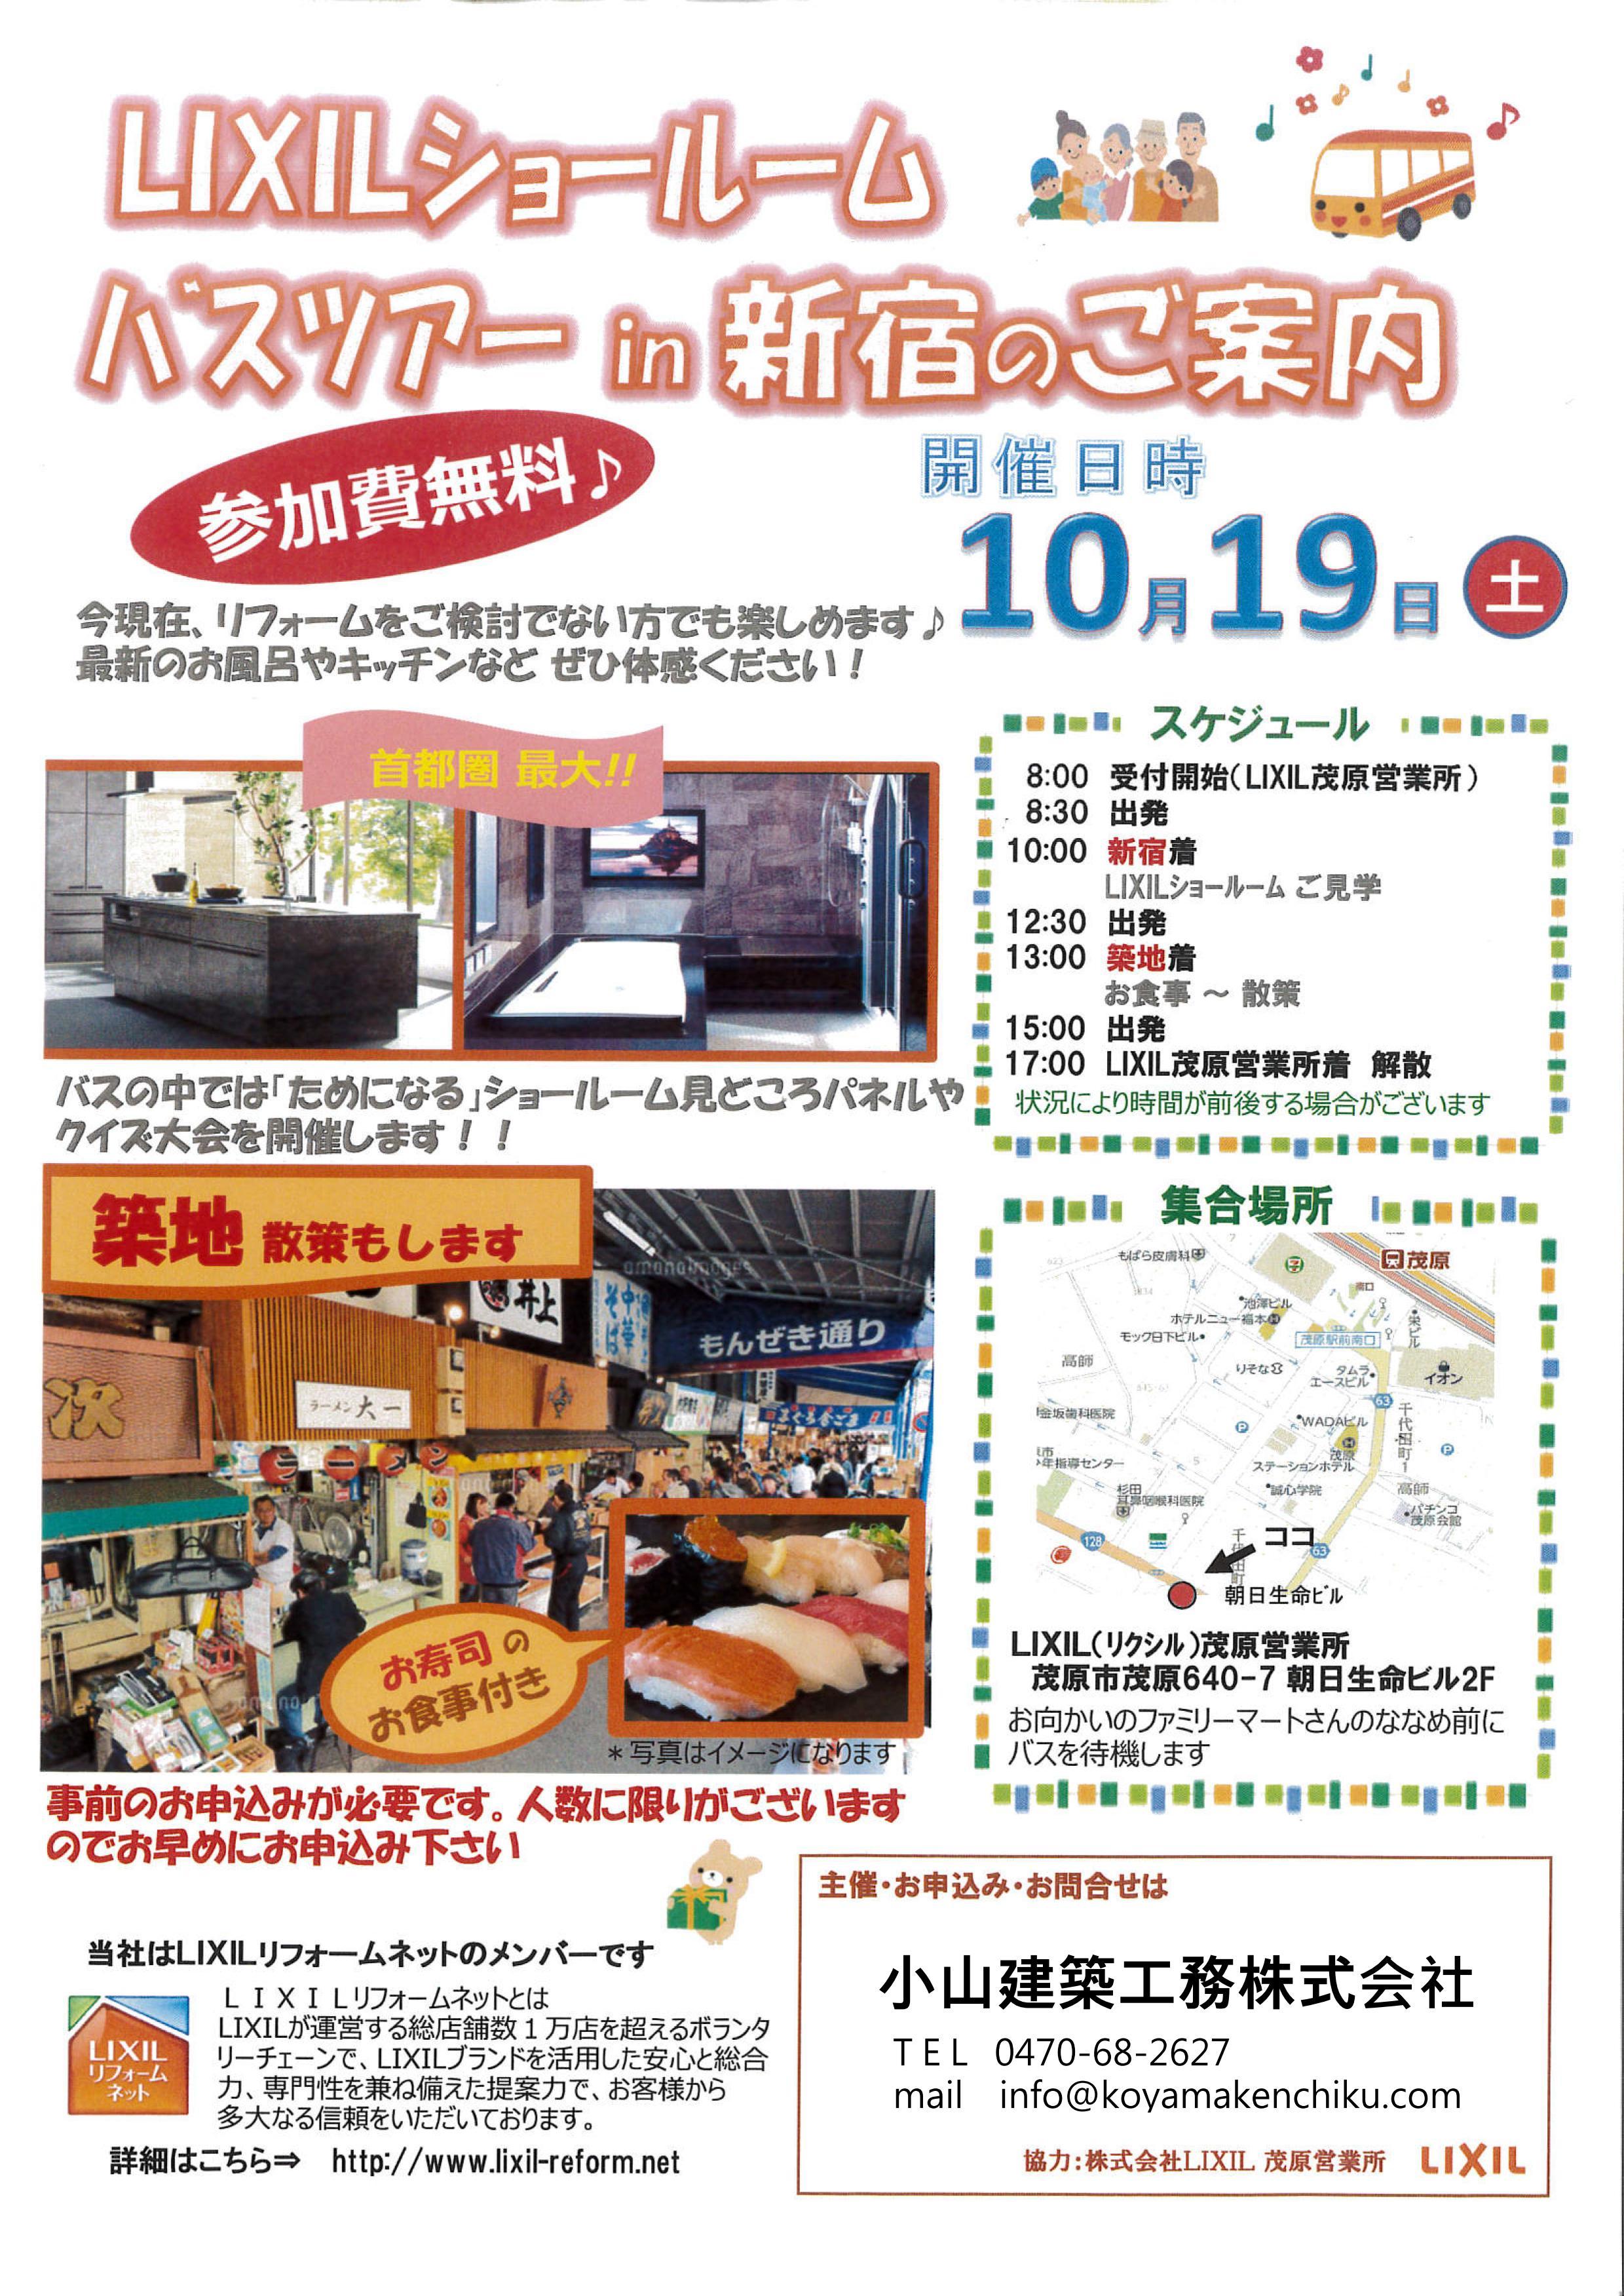 LIXILショールームバスツアーin新宿20191019sat